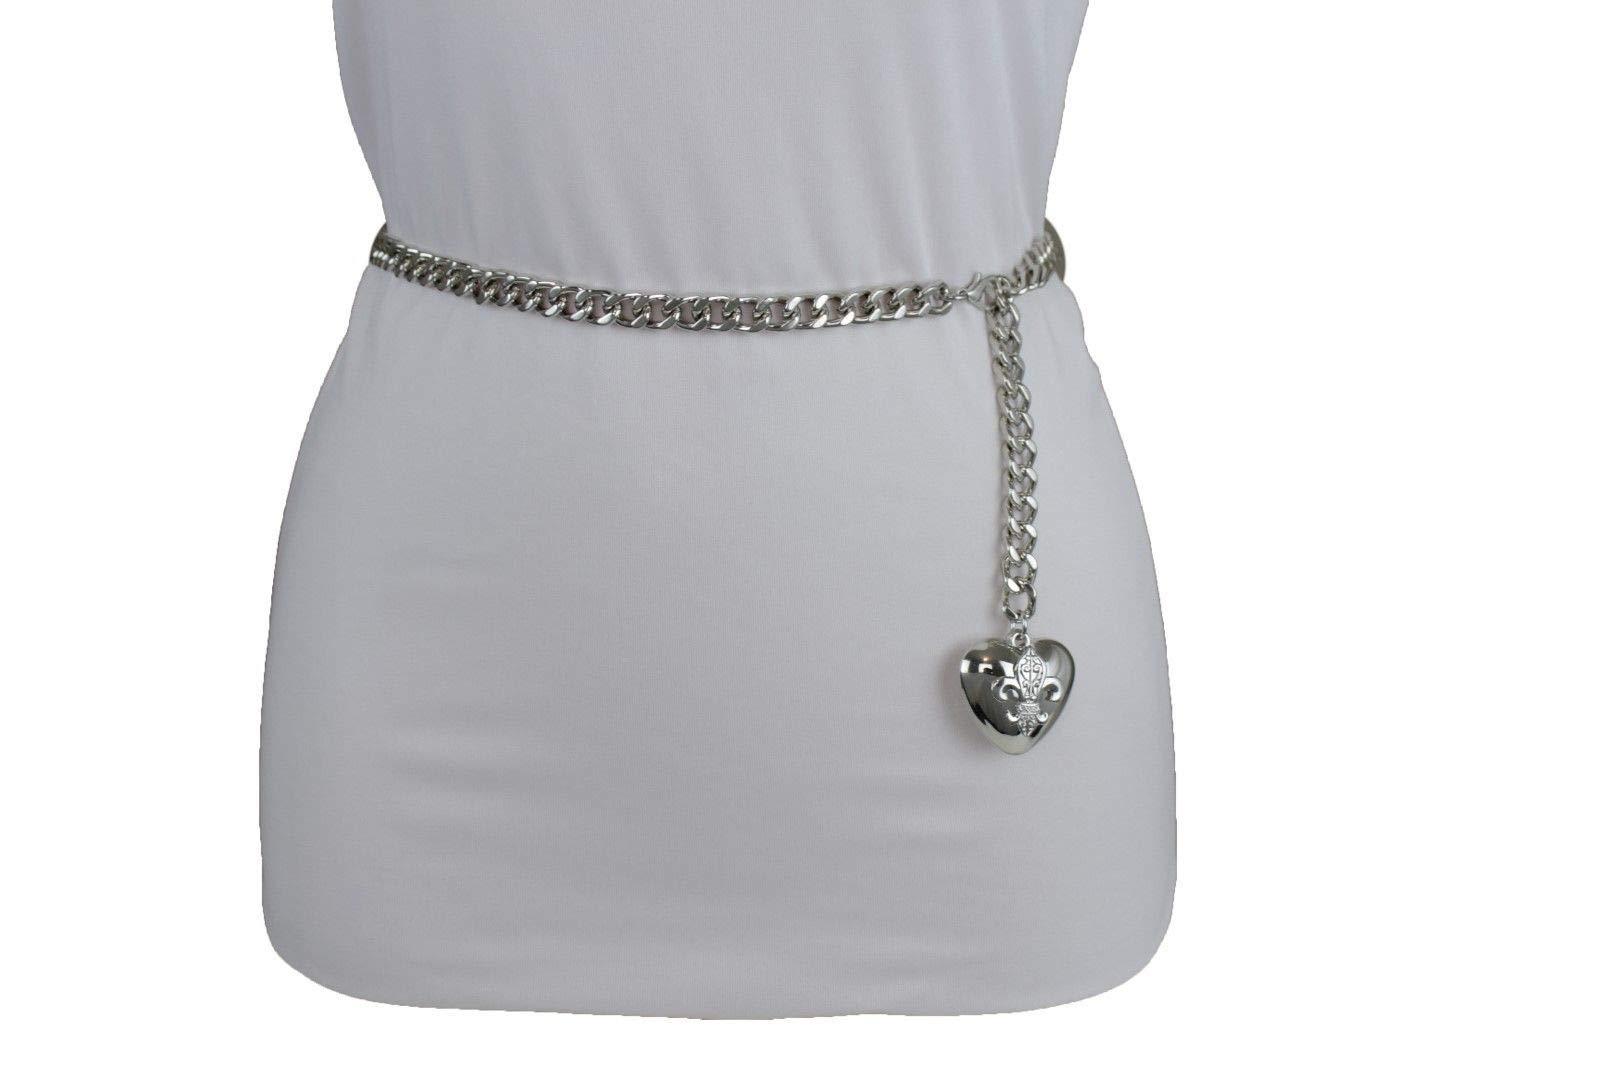 Women Hip Waist Silver Metal Chain Fashion Belt Love Heart Buckle Charm XS S M by RIX Fashion Luxury (Image #4)